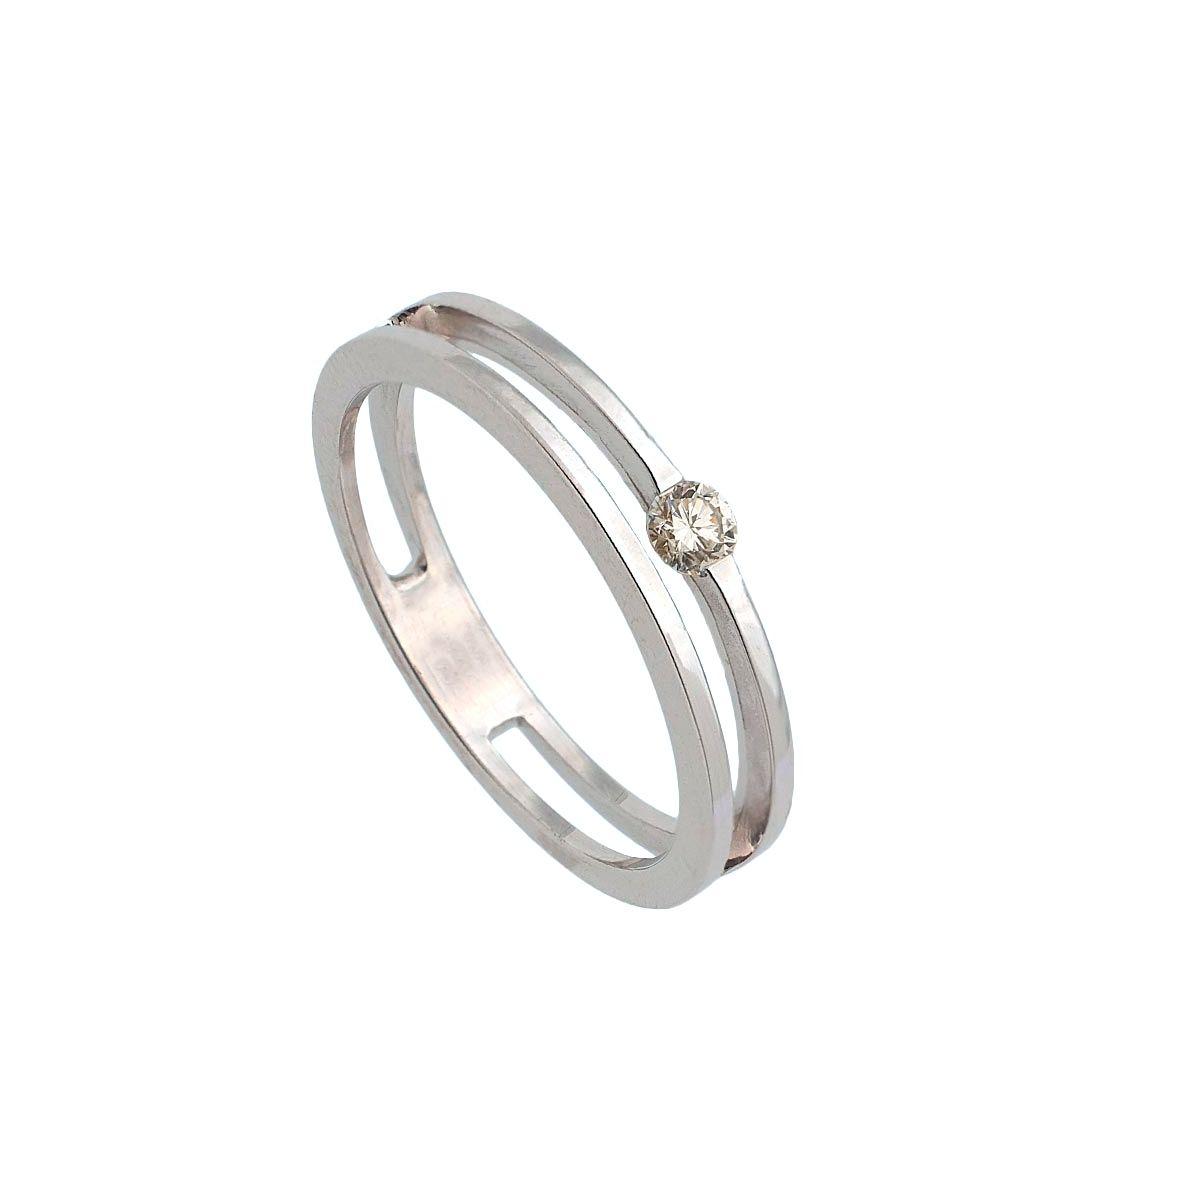 Sortija de oro blanco con dos anillos...